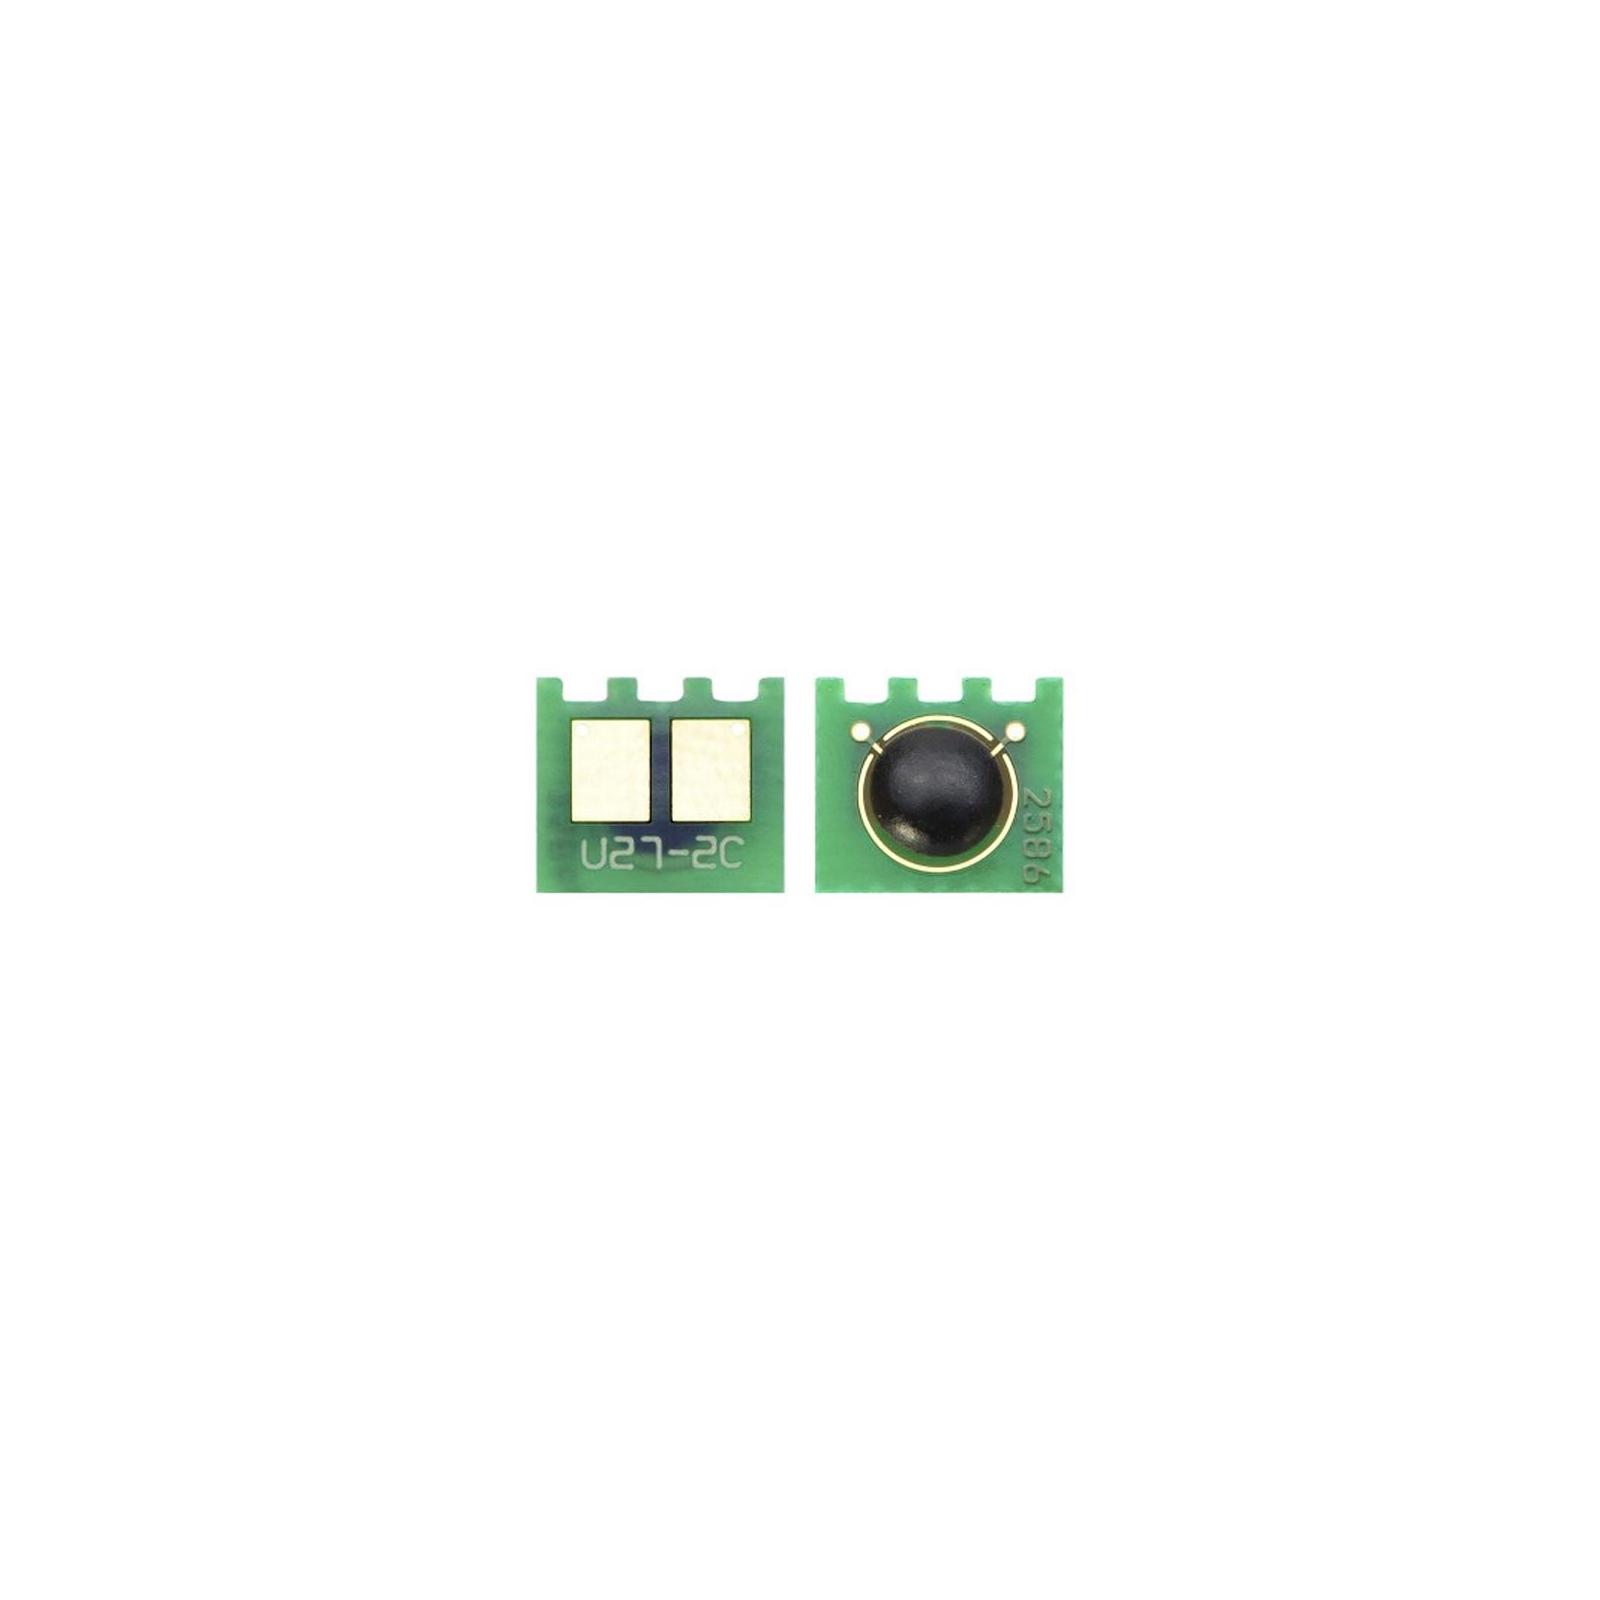 Чип для картриджа HP CLJ CP2025, Canon 716/718 cyan Static Control (U27-2CHIP-C)